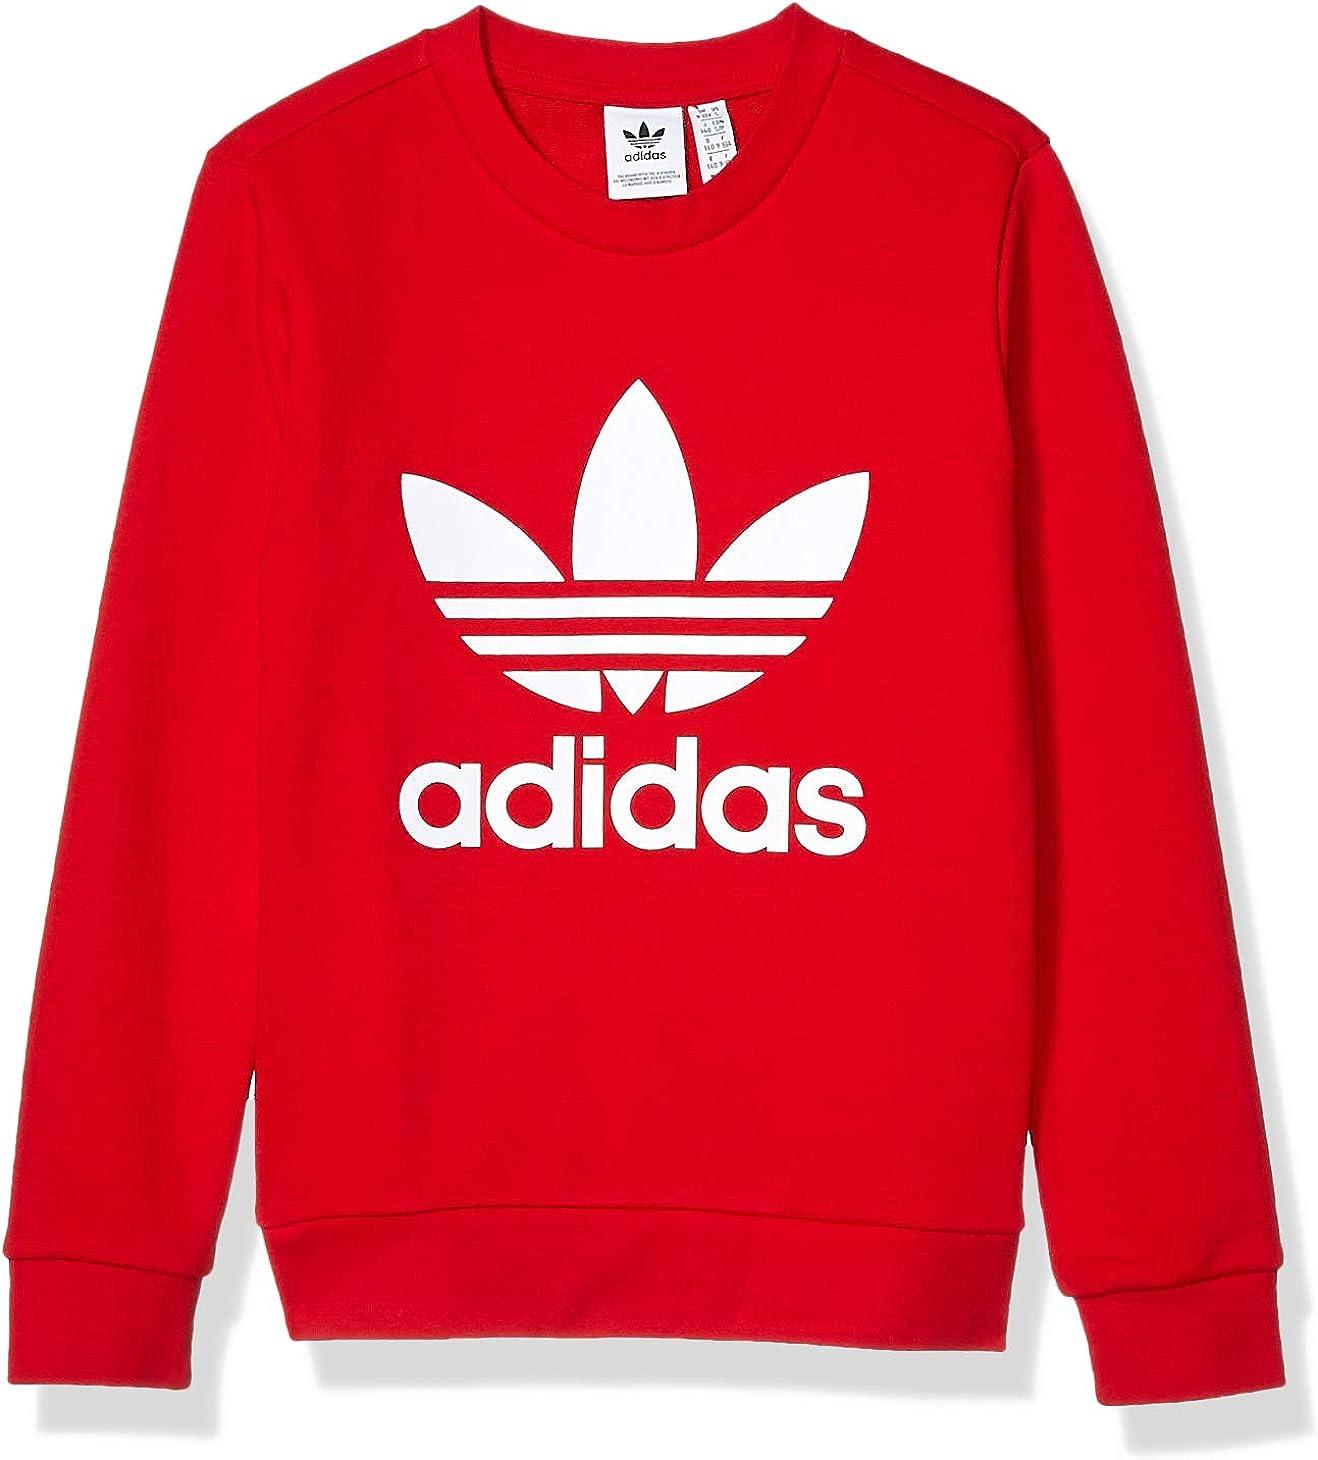 Amazon Com Adidas Originals Little Kids Trefoil Crewneck Sweatshirt Clothing [ 1460 x 1320 Pixel ]